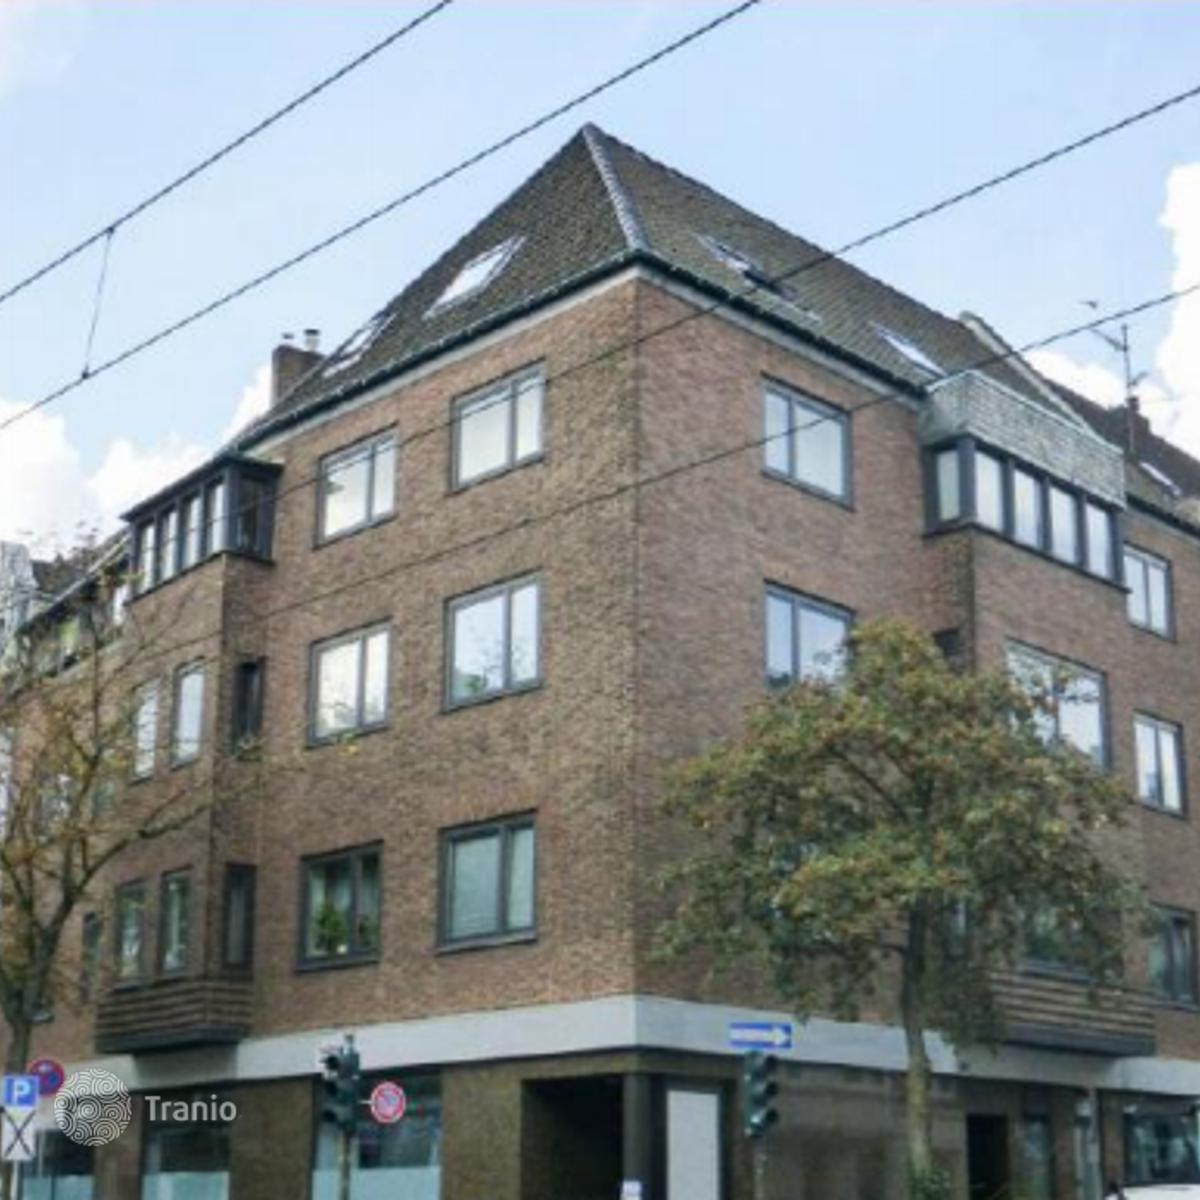 listing 1210688 in dusseldorf north rhine westphalia germany apartment building overseas. Black Bedroom Furniture Sets. Home Design Ideas